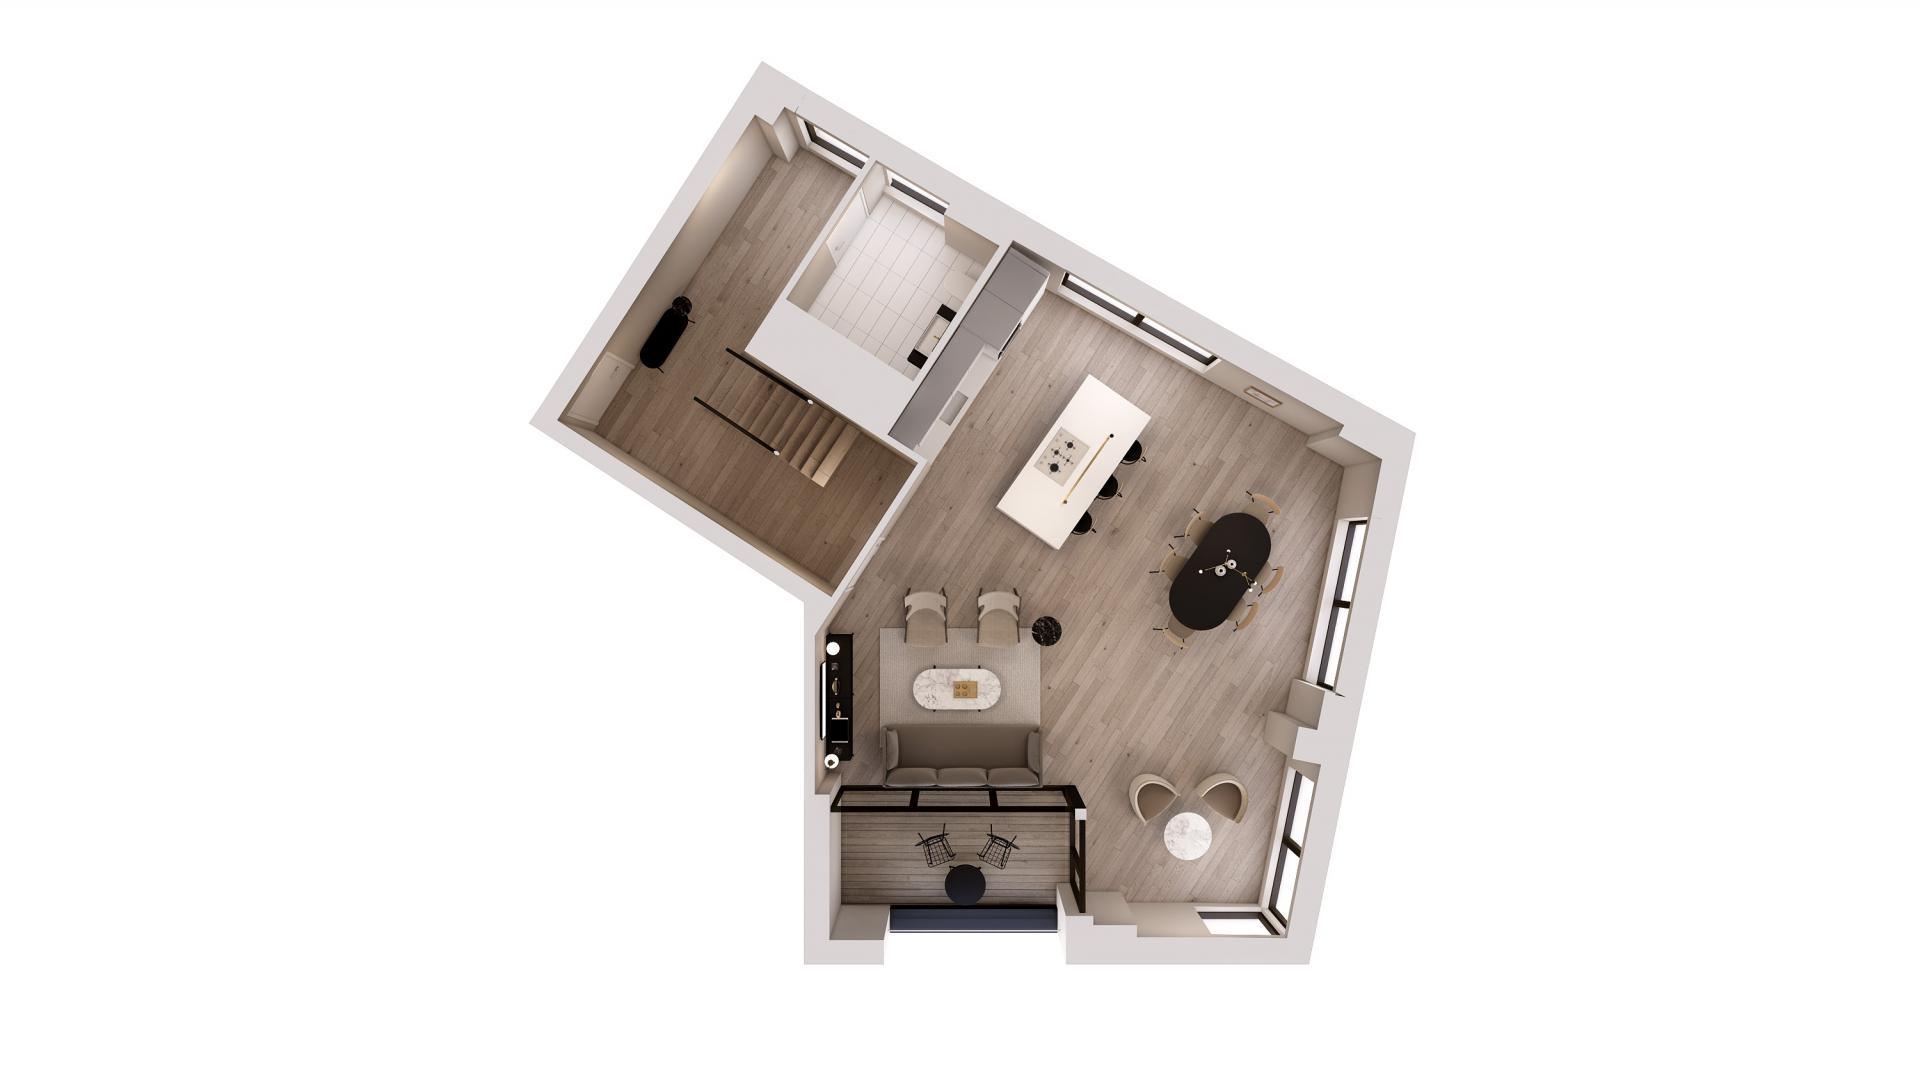 Duplex 3 bed floor plan at STAY Camden Serviced Apartments, Camden, London